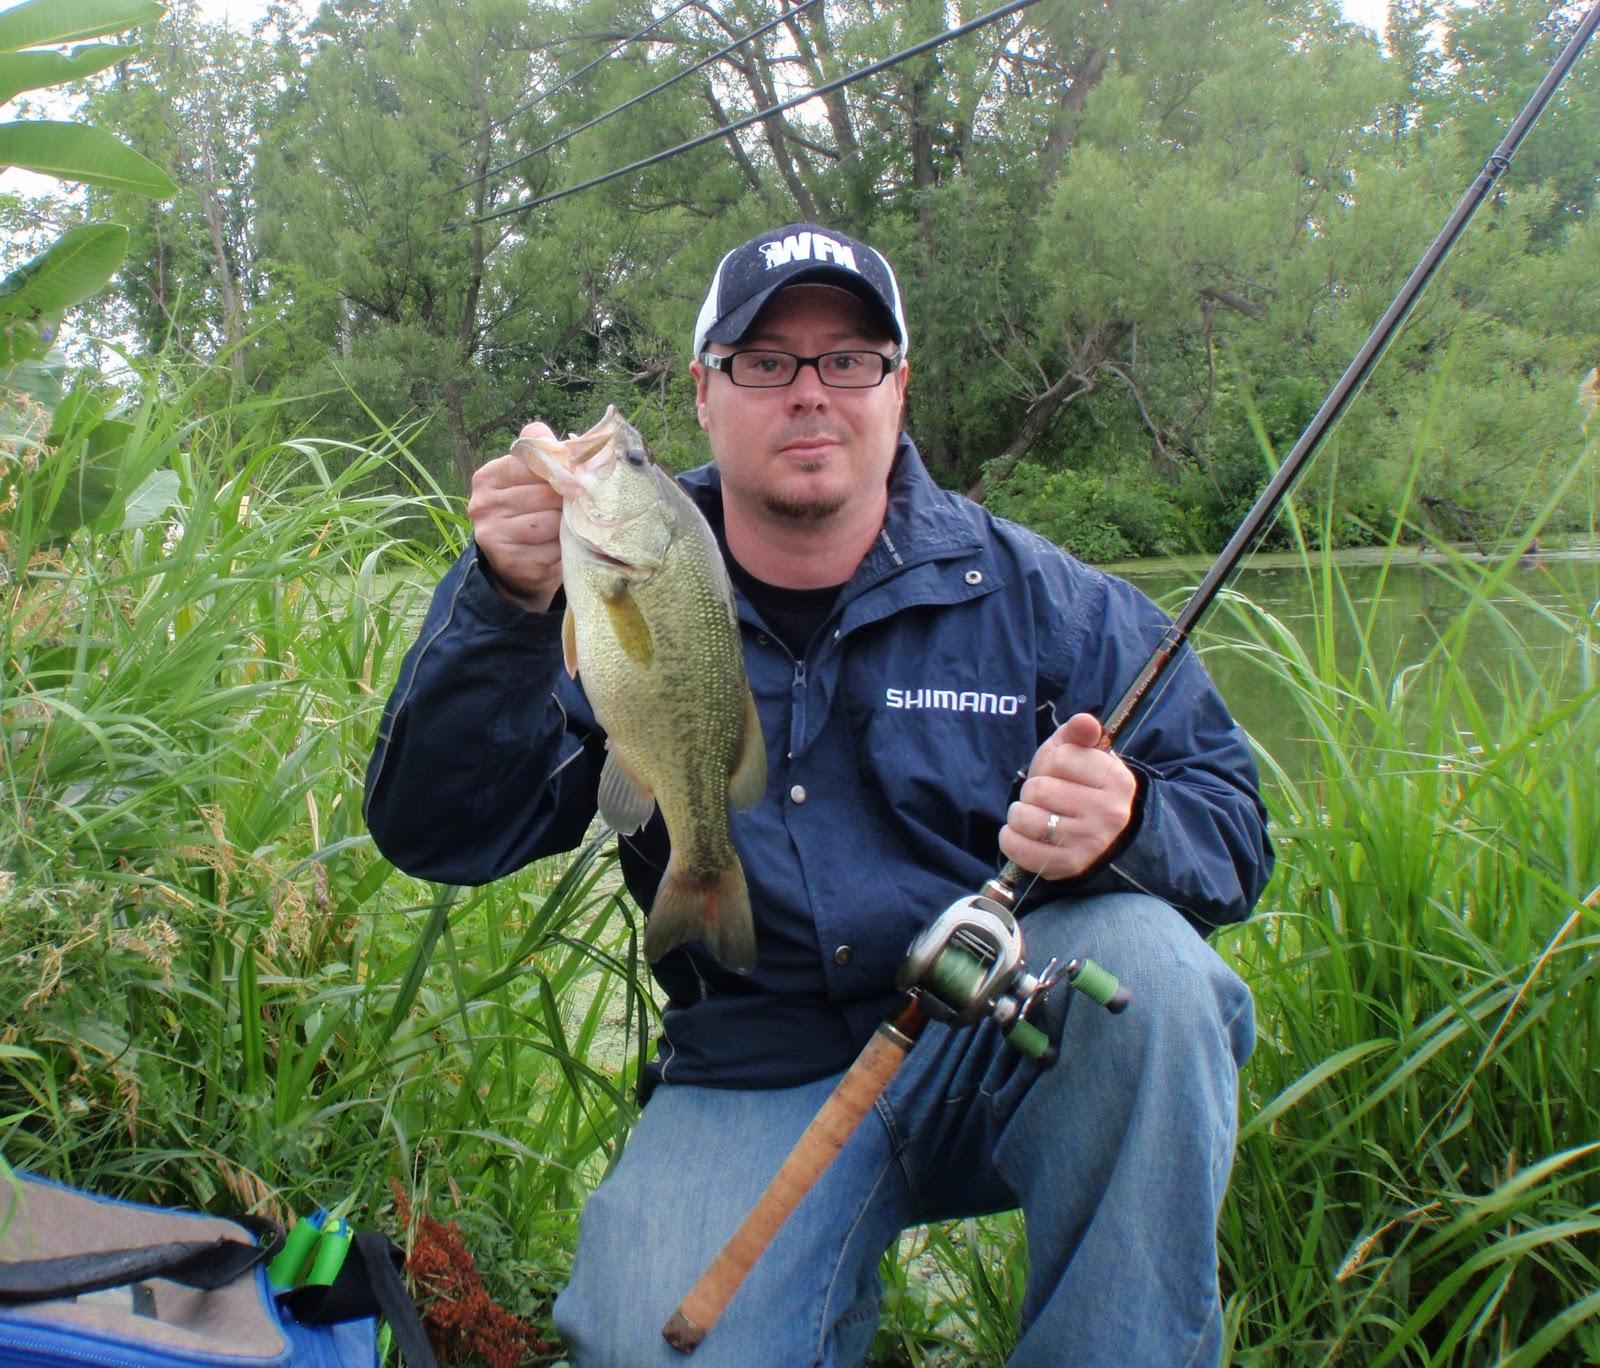 Bass junkies fishing addiction 2011 bass season comes to for Bass fishing season